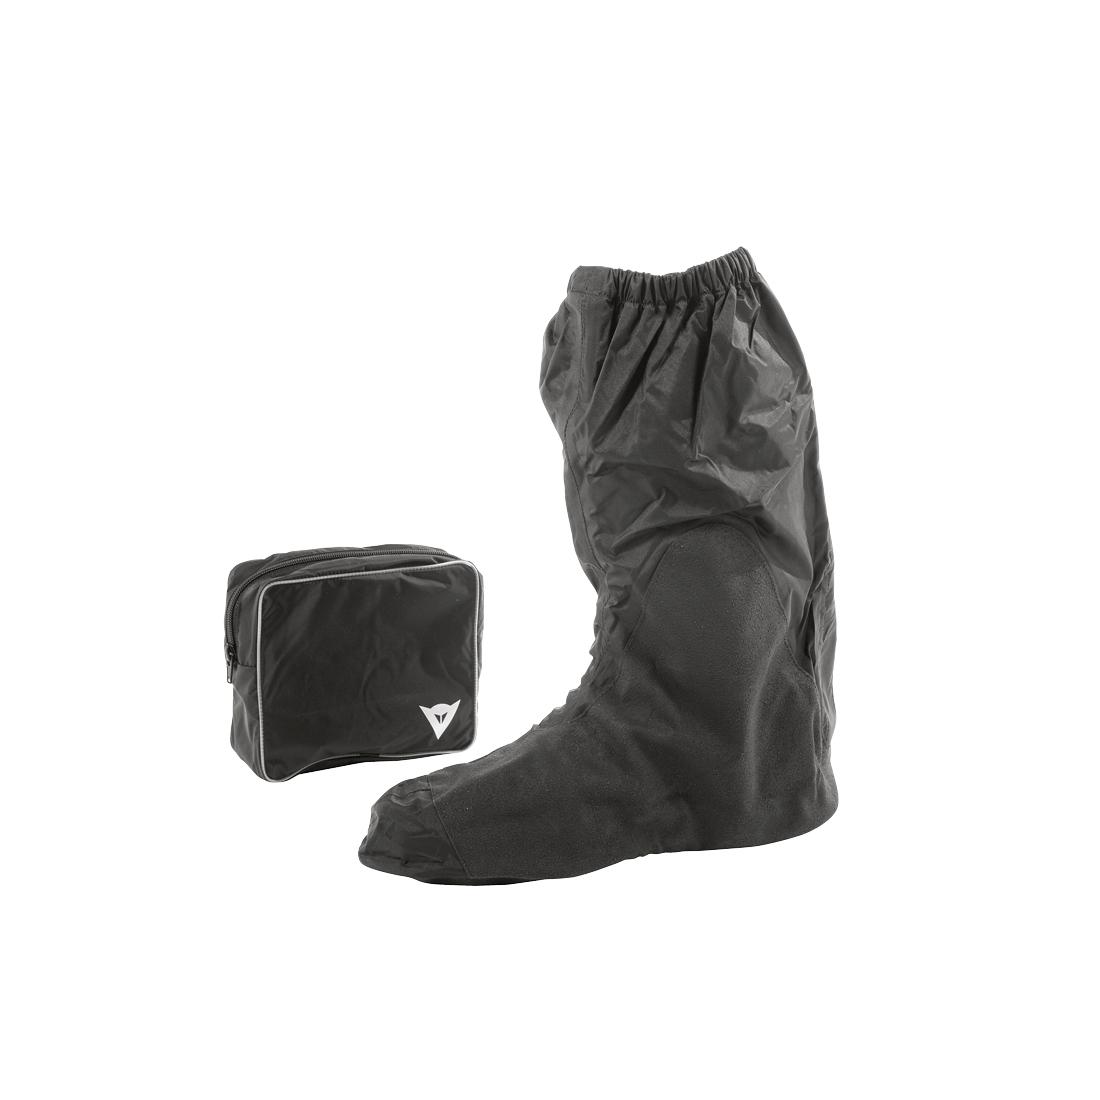 【DAINESE】OVERBOOT 防雨靴套 - 「Webike-摩托百貨」